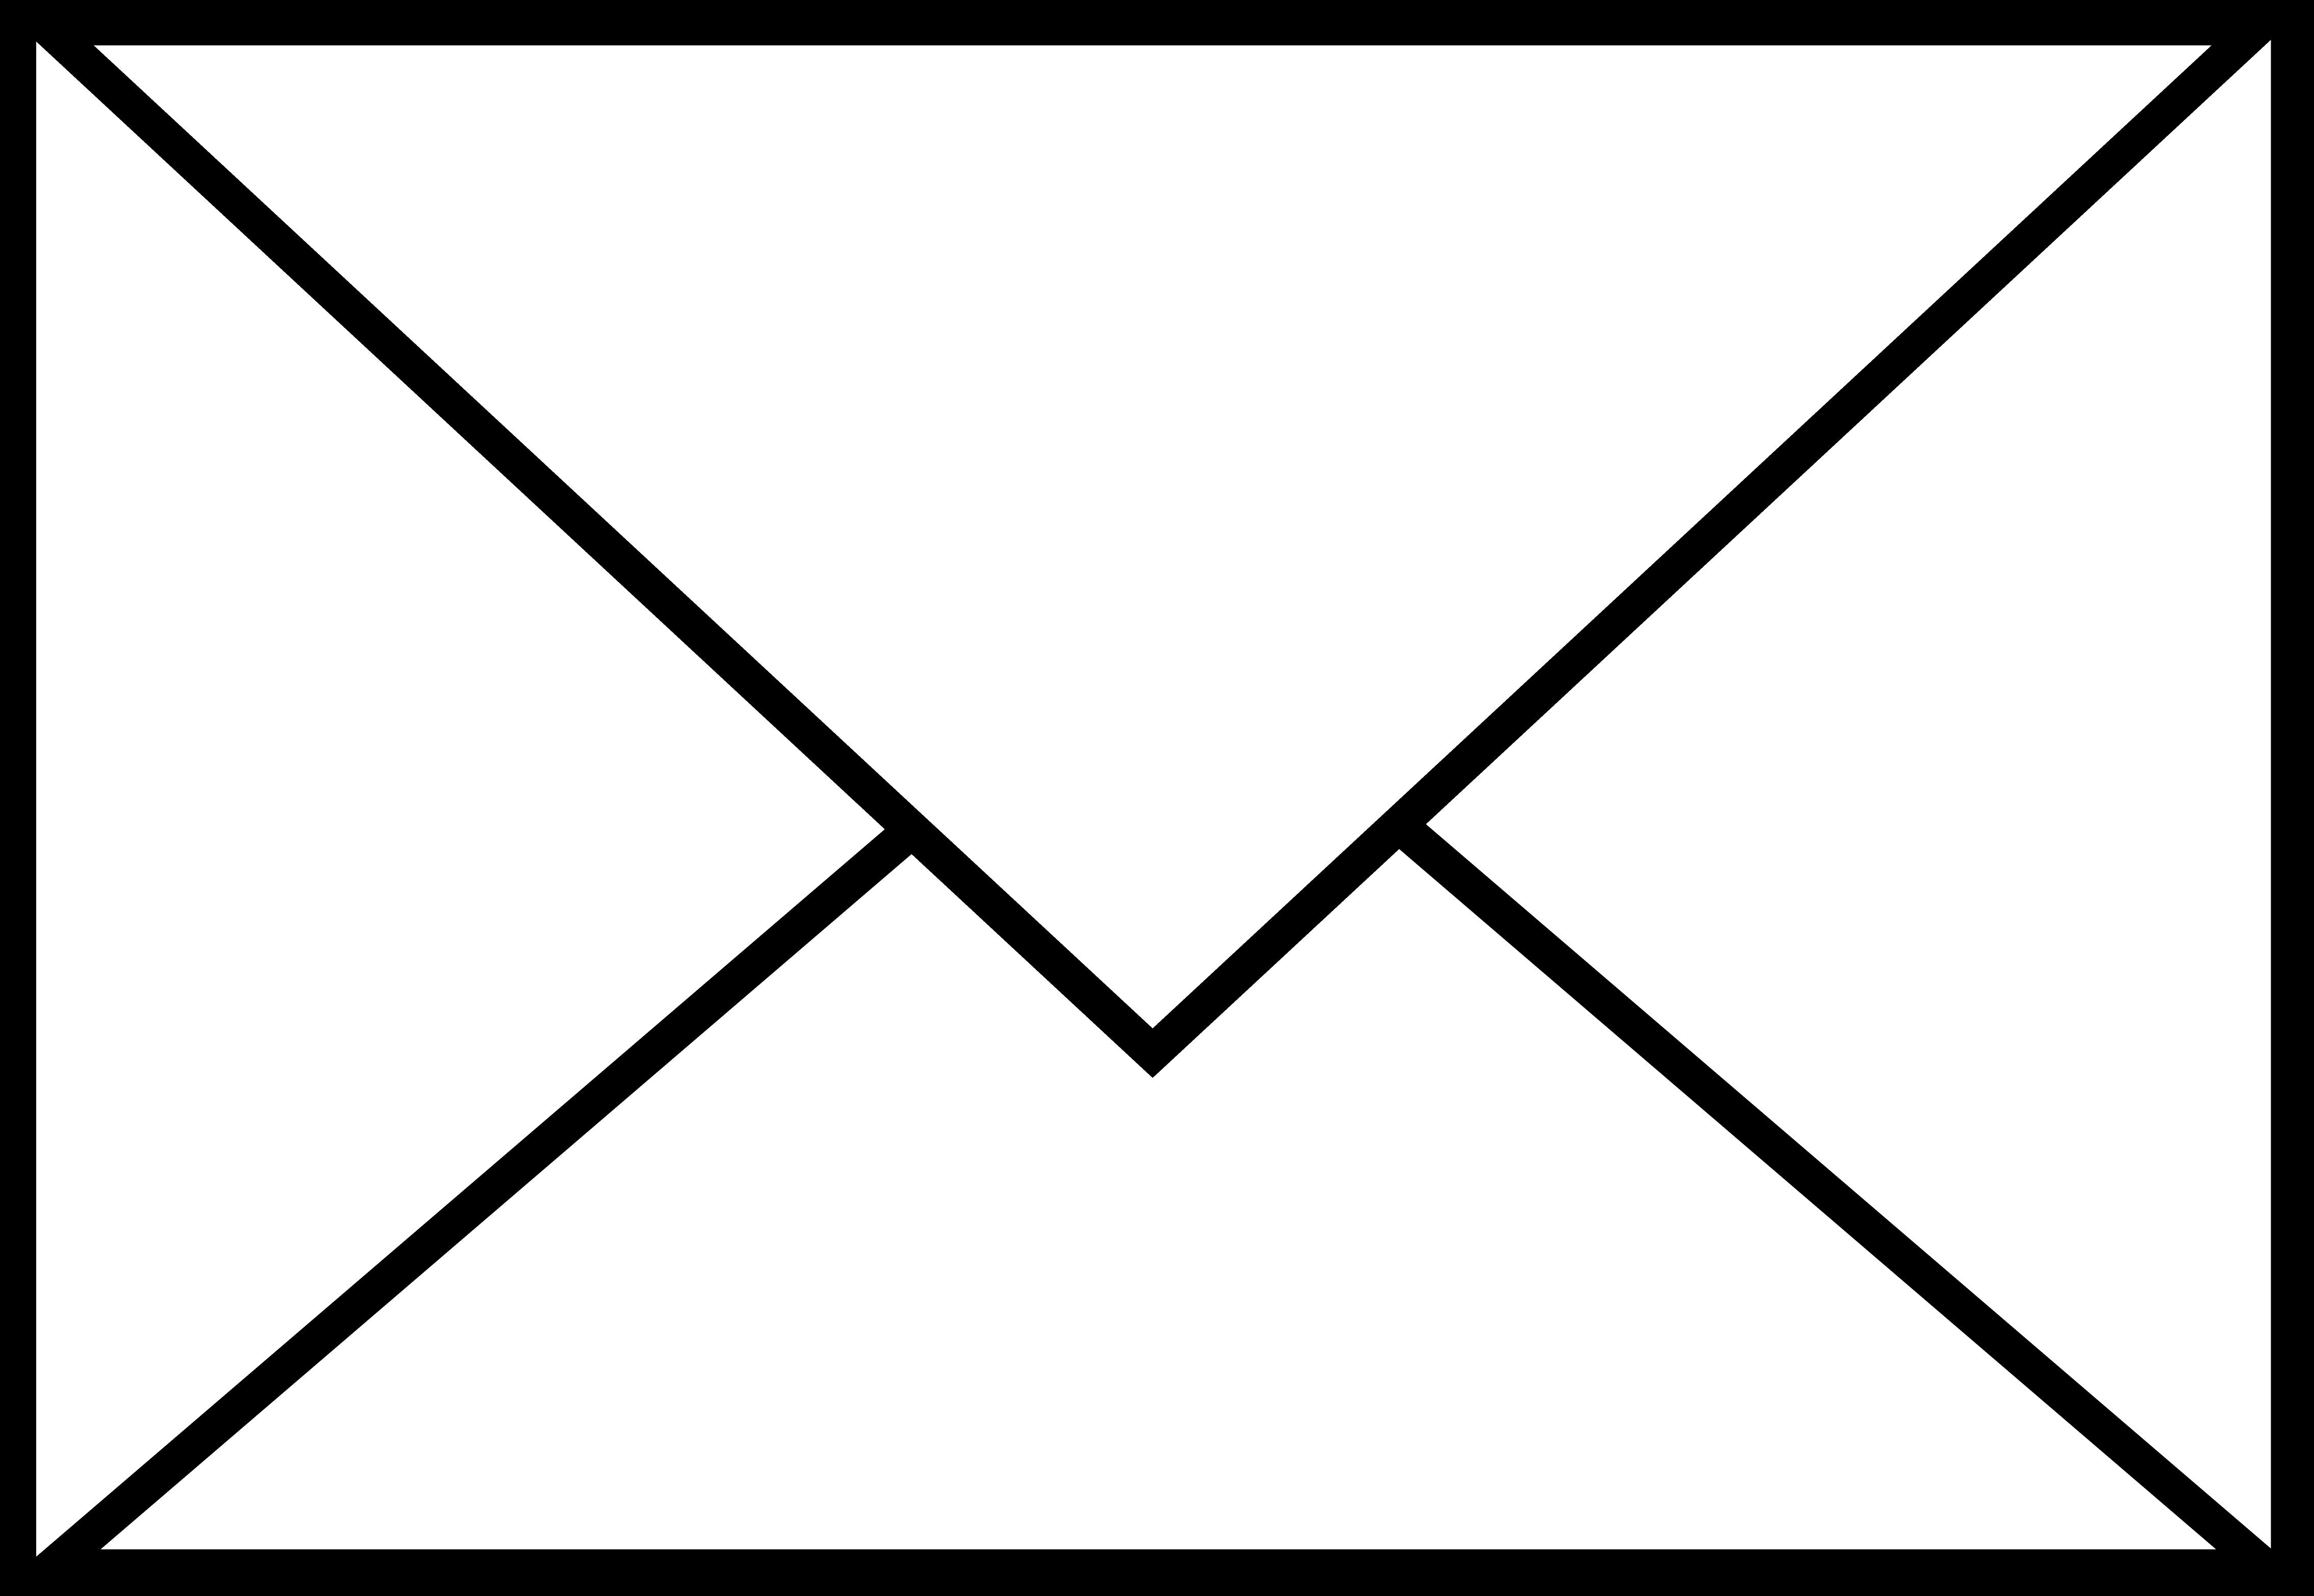 Clipart for envelopes clip art Envelope clip art free clipart images - ClipartPost clip art